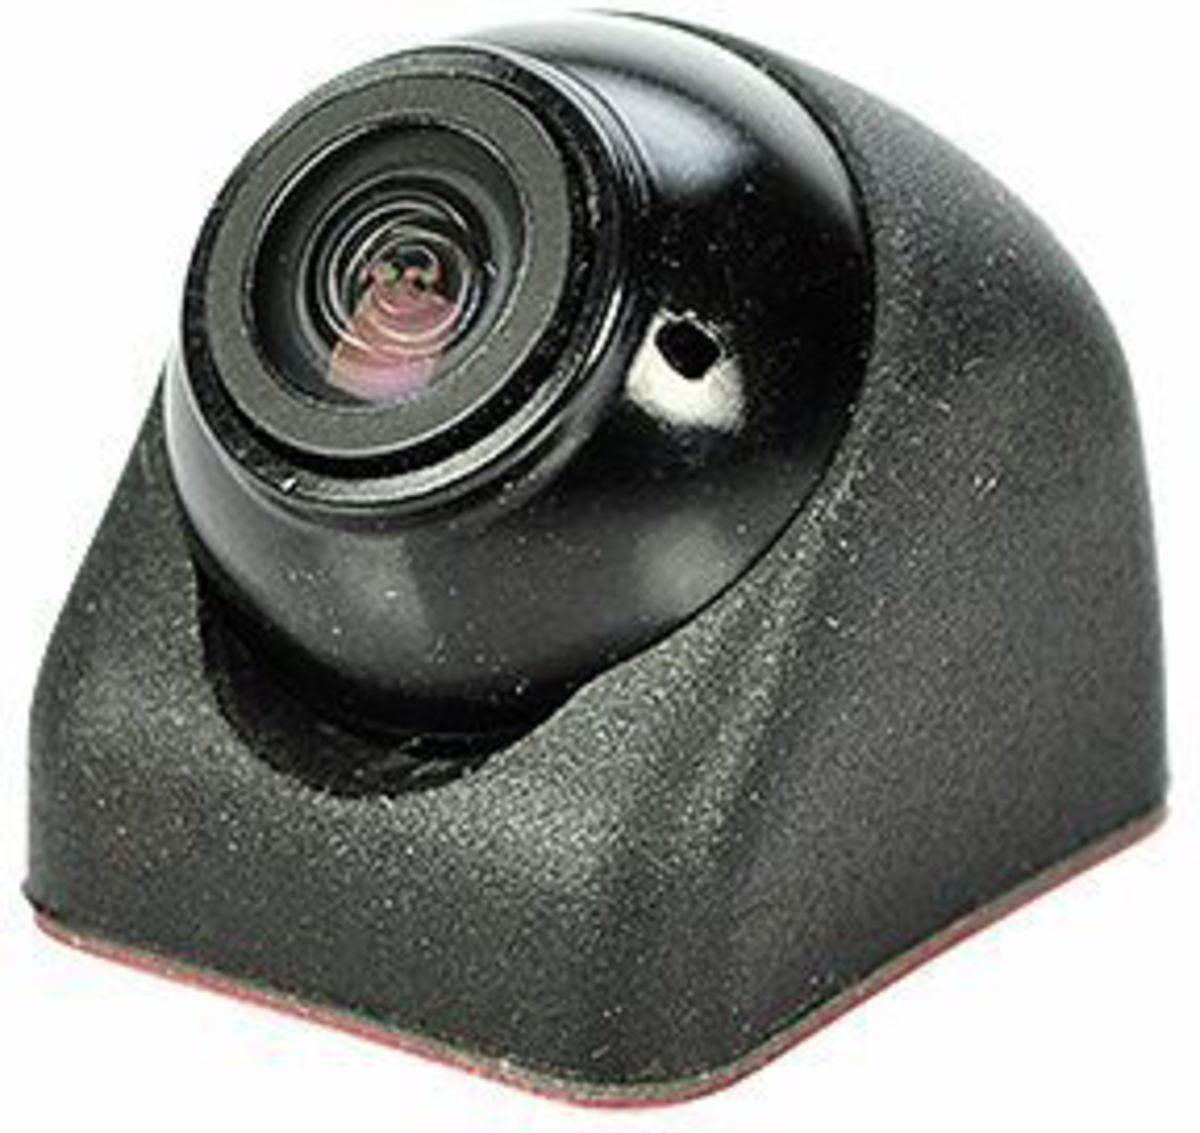 Axion Rückfahrkamera »Farb-Rückfahr-Kamera (Mini Ball) 8m Leitung«